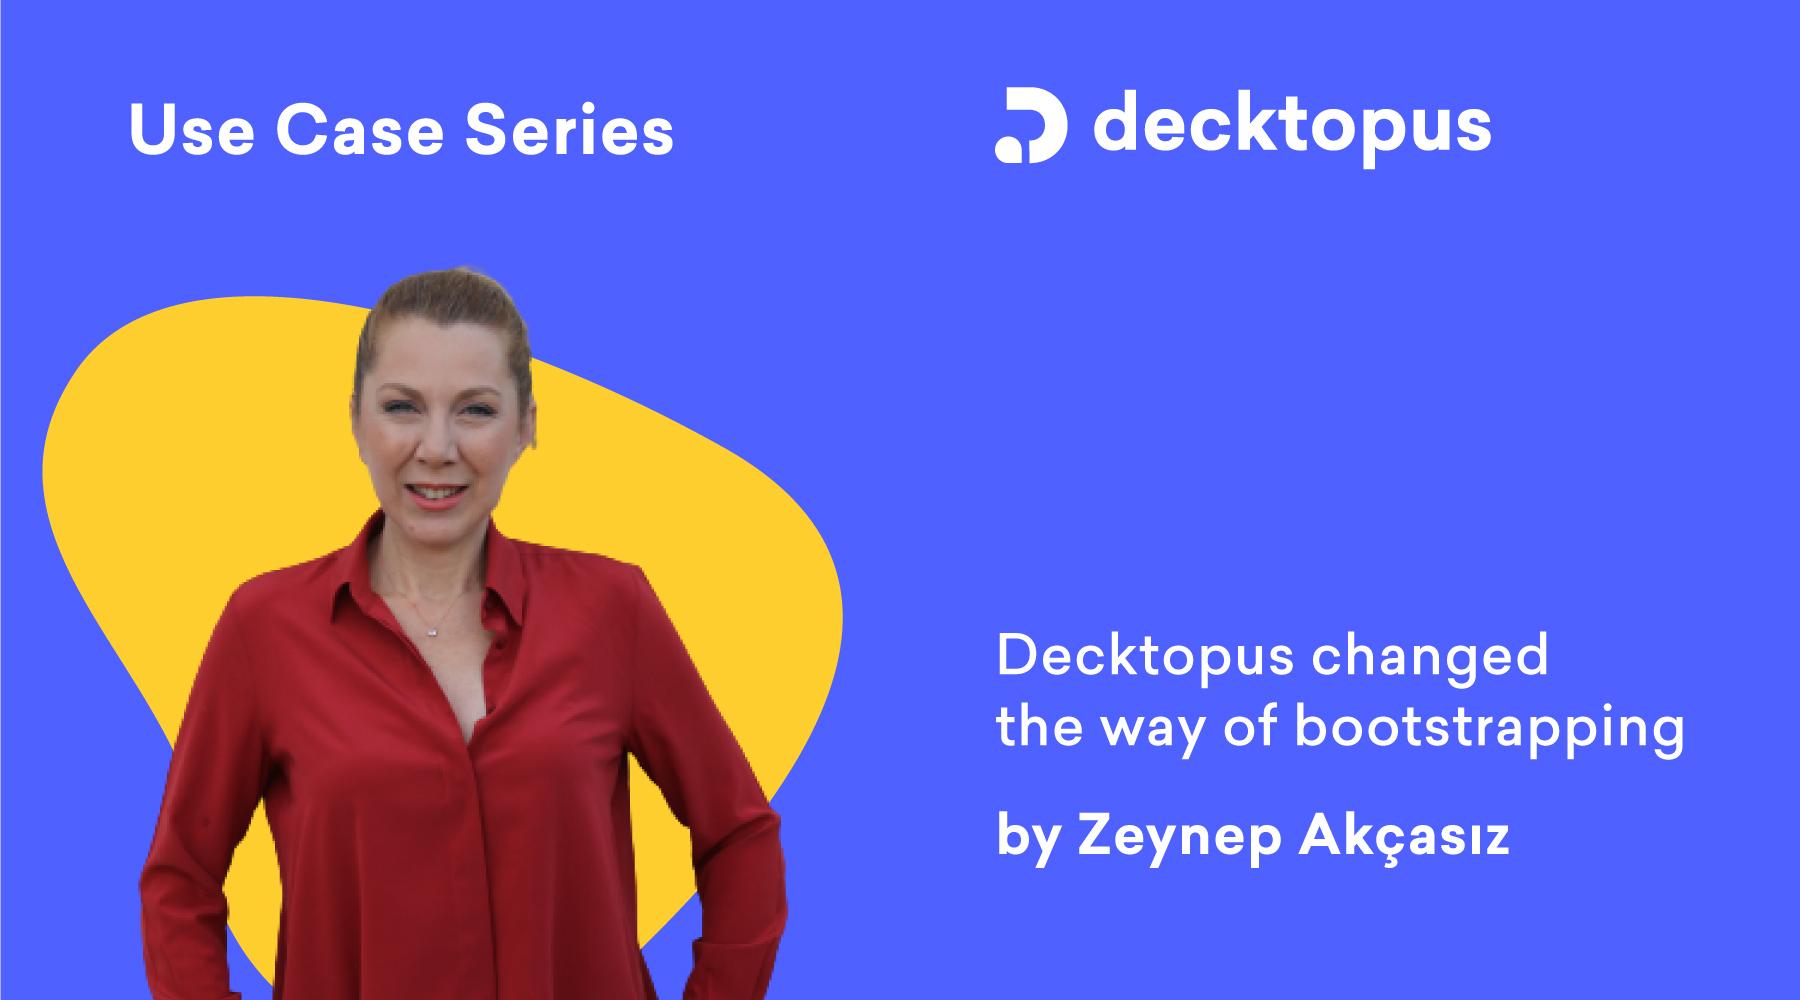 Use Case Series prepared by Decktopus Content Team